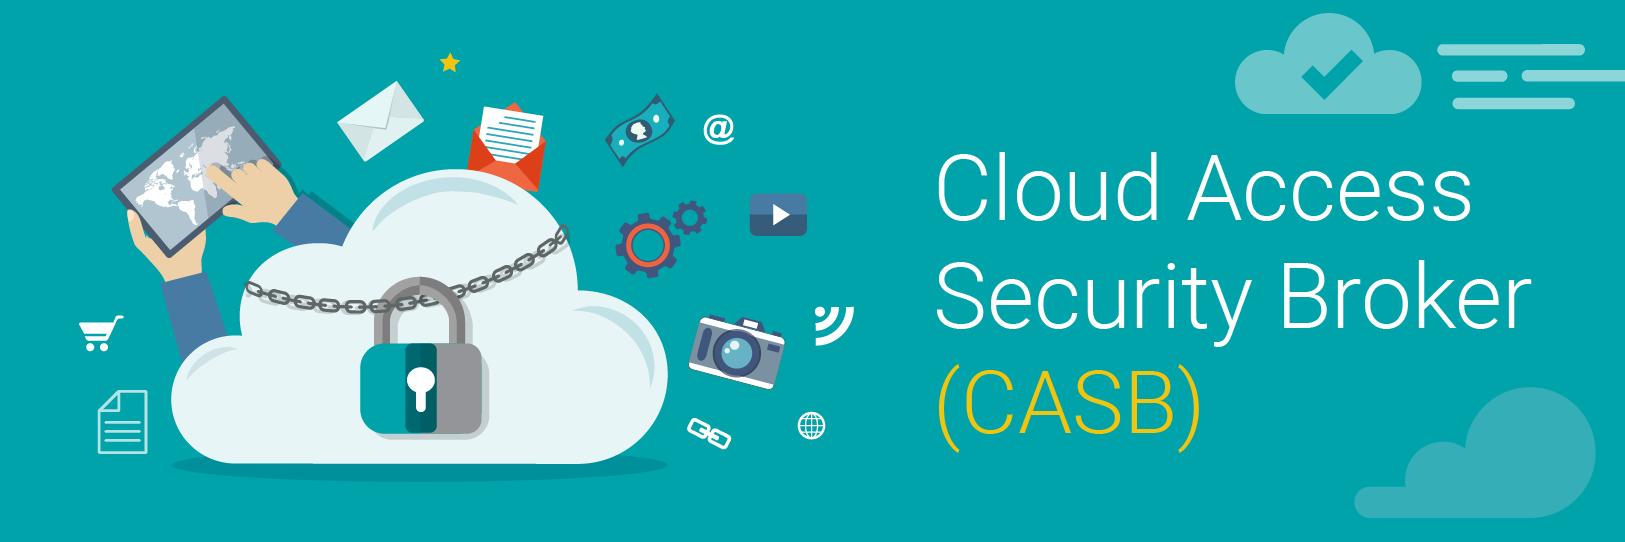 Safe-T Box Cloud Access Security Broker (CASB) Video